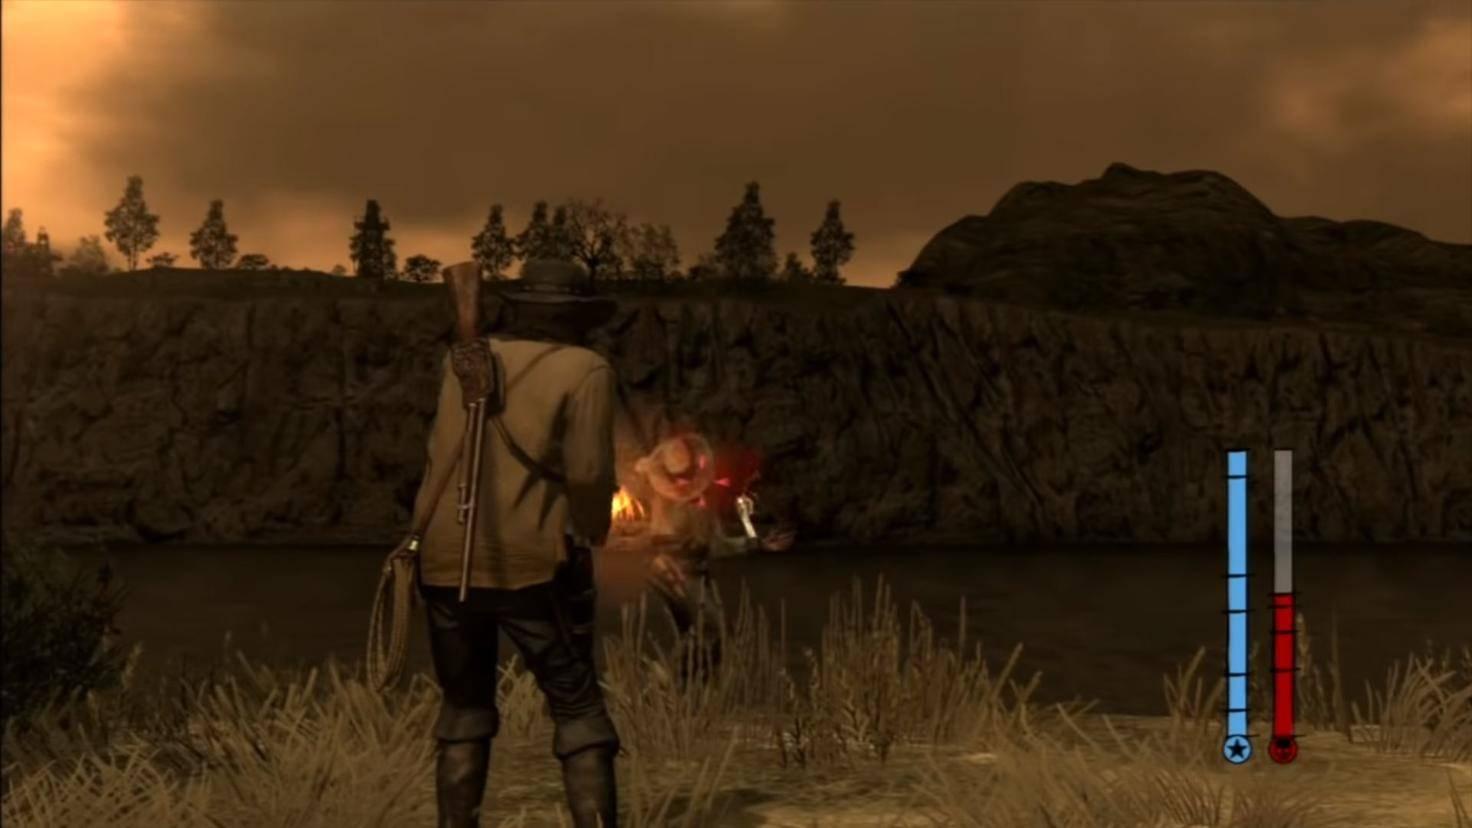 red-dead-redemption-jach-vs-edgar-screenshot